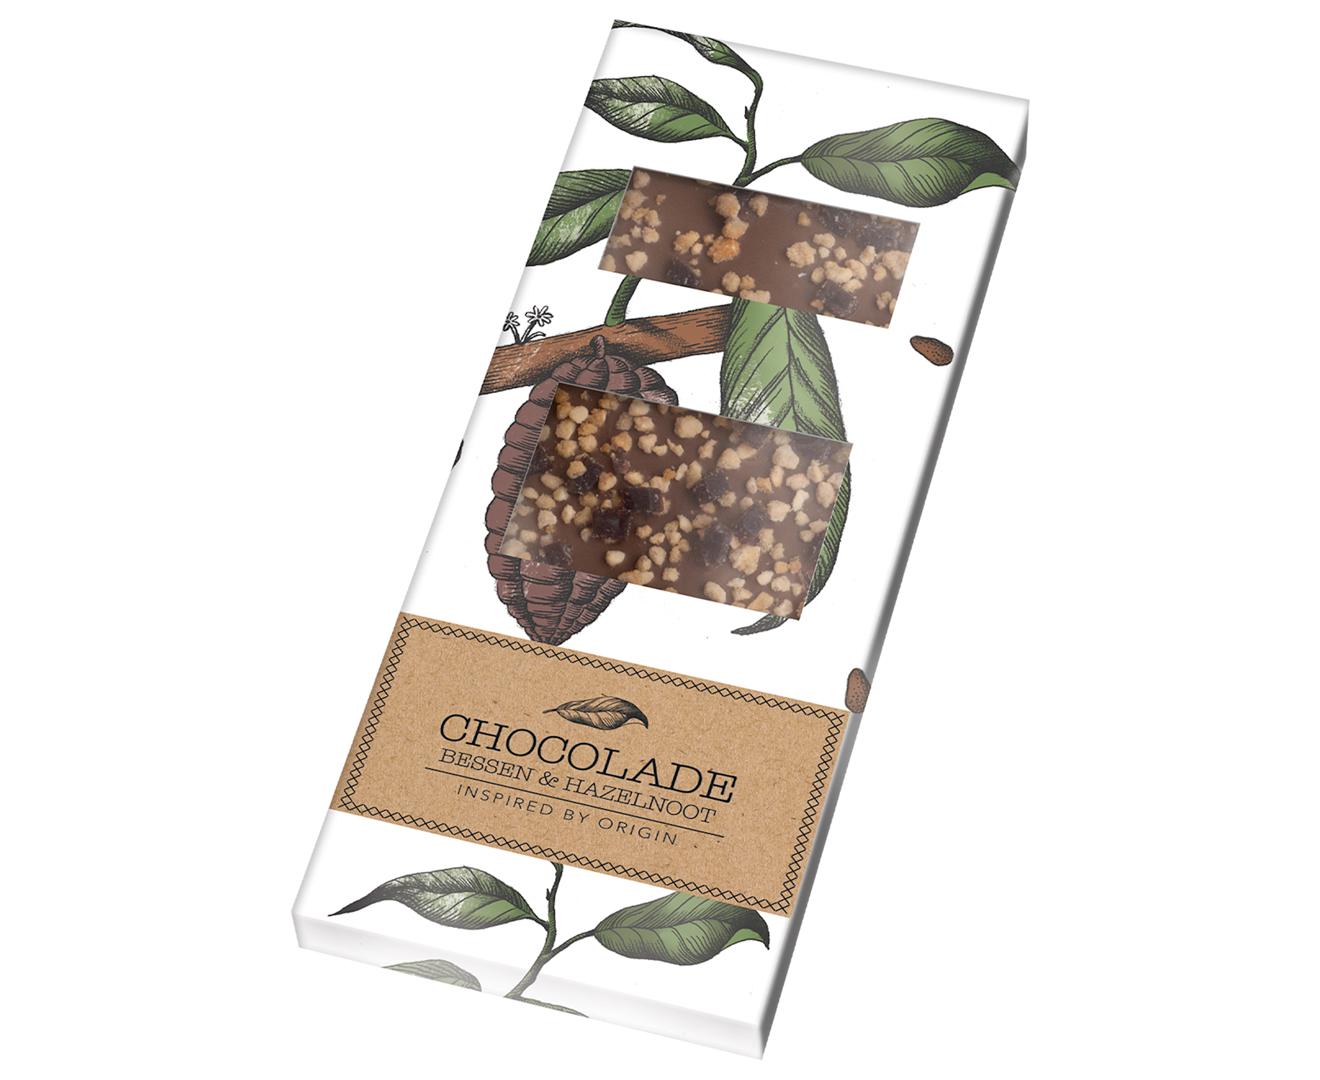 Productafbeelding Chocoladereep Inspired by origin 80g doos